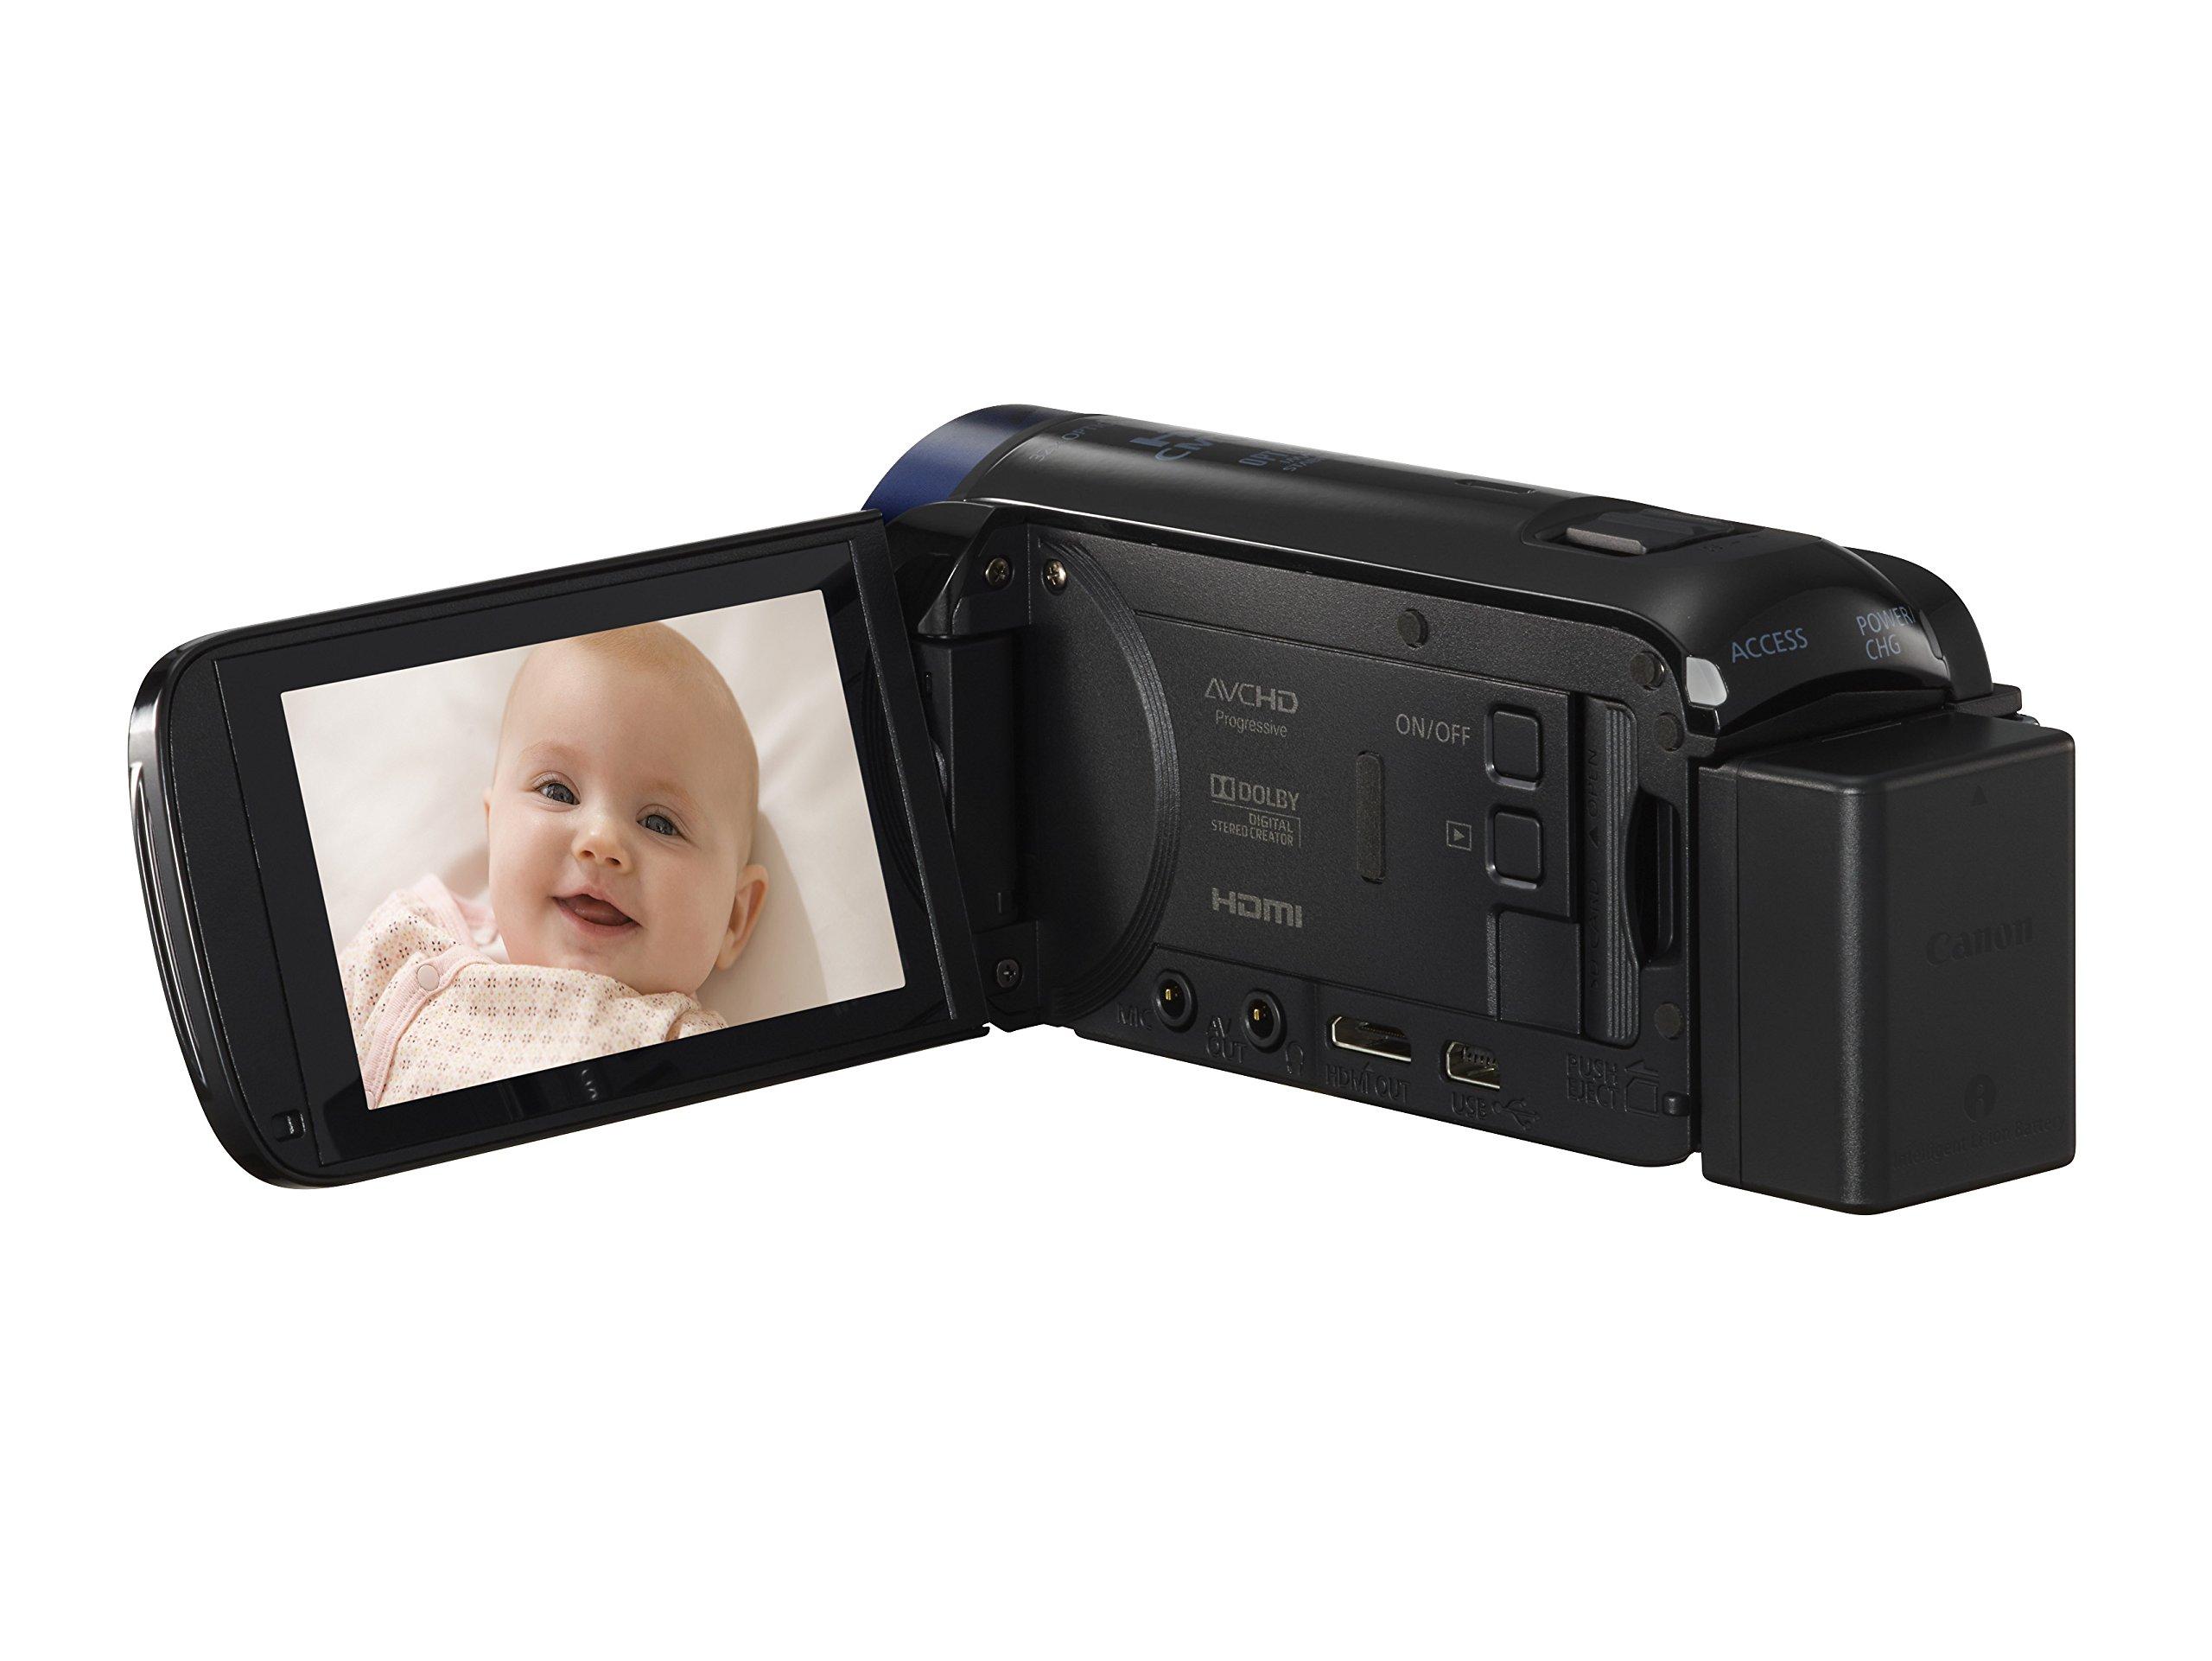 HFR40 HFR42 HFR60 HFR300 Lightweight 57-inch Professional Camera Tripod for Canon Vixia HFR80 HFR82 HFR800 HFR600 Camcorders HFR70 HFR62 HFR52 HFR32 HFR72 HFR50 HFR400 HFR700 HFR500